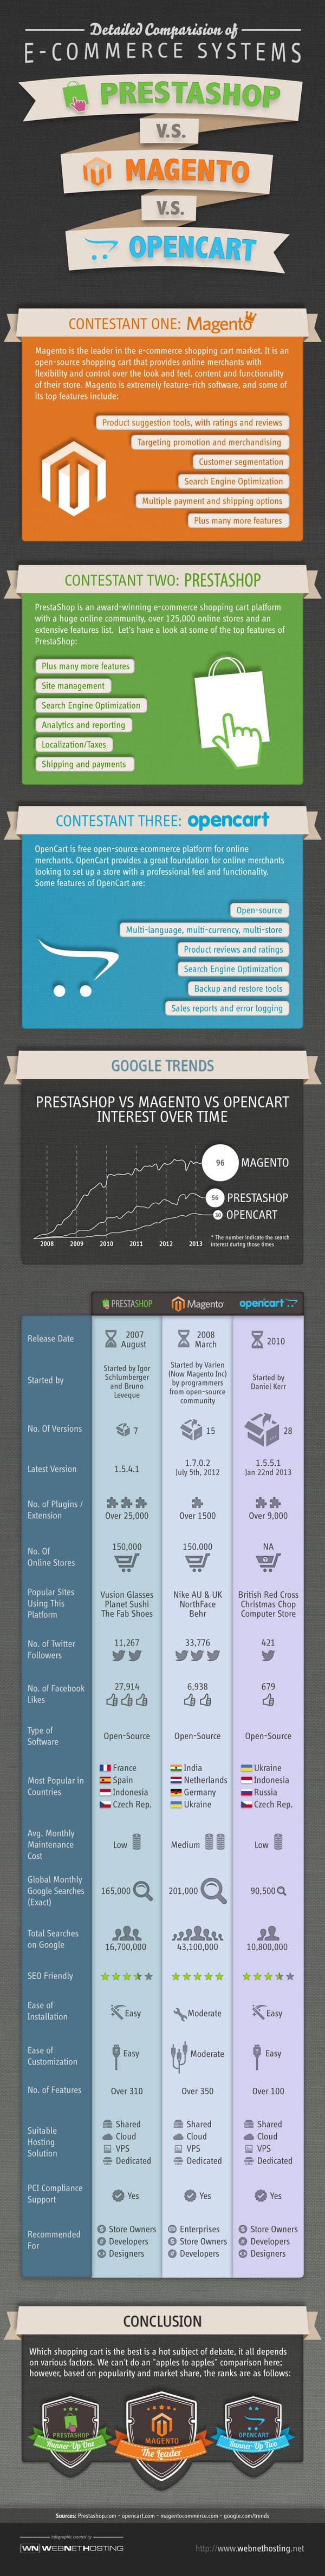 Prestashop vs Magento vs Opencart infographic